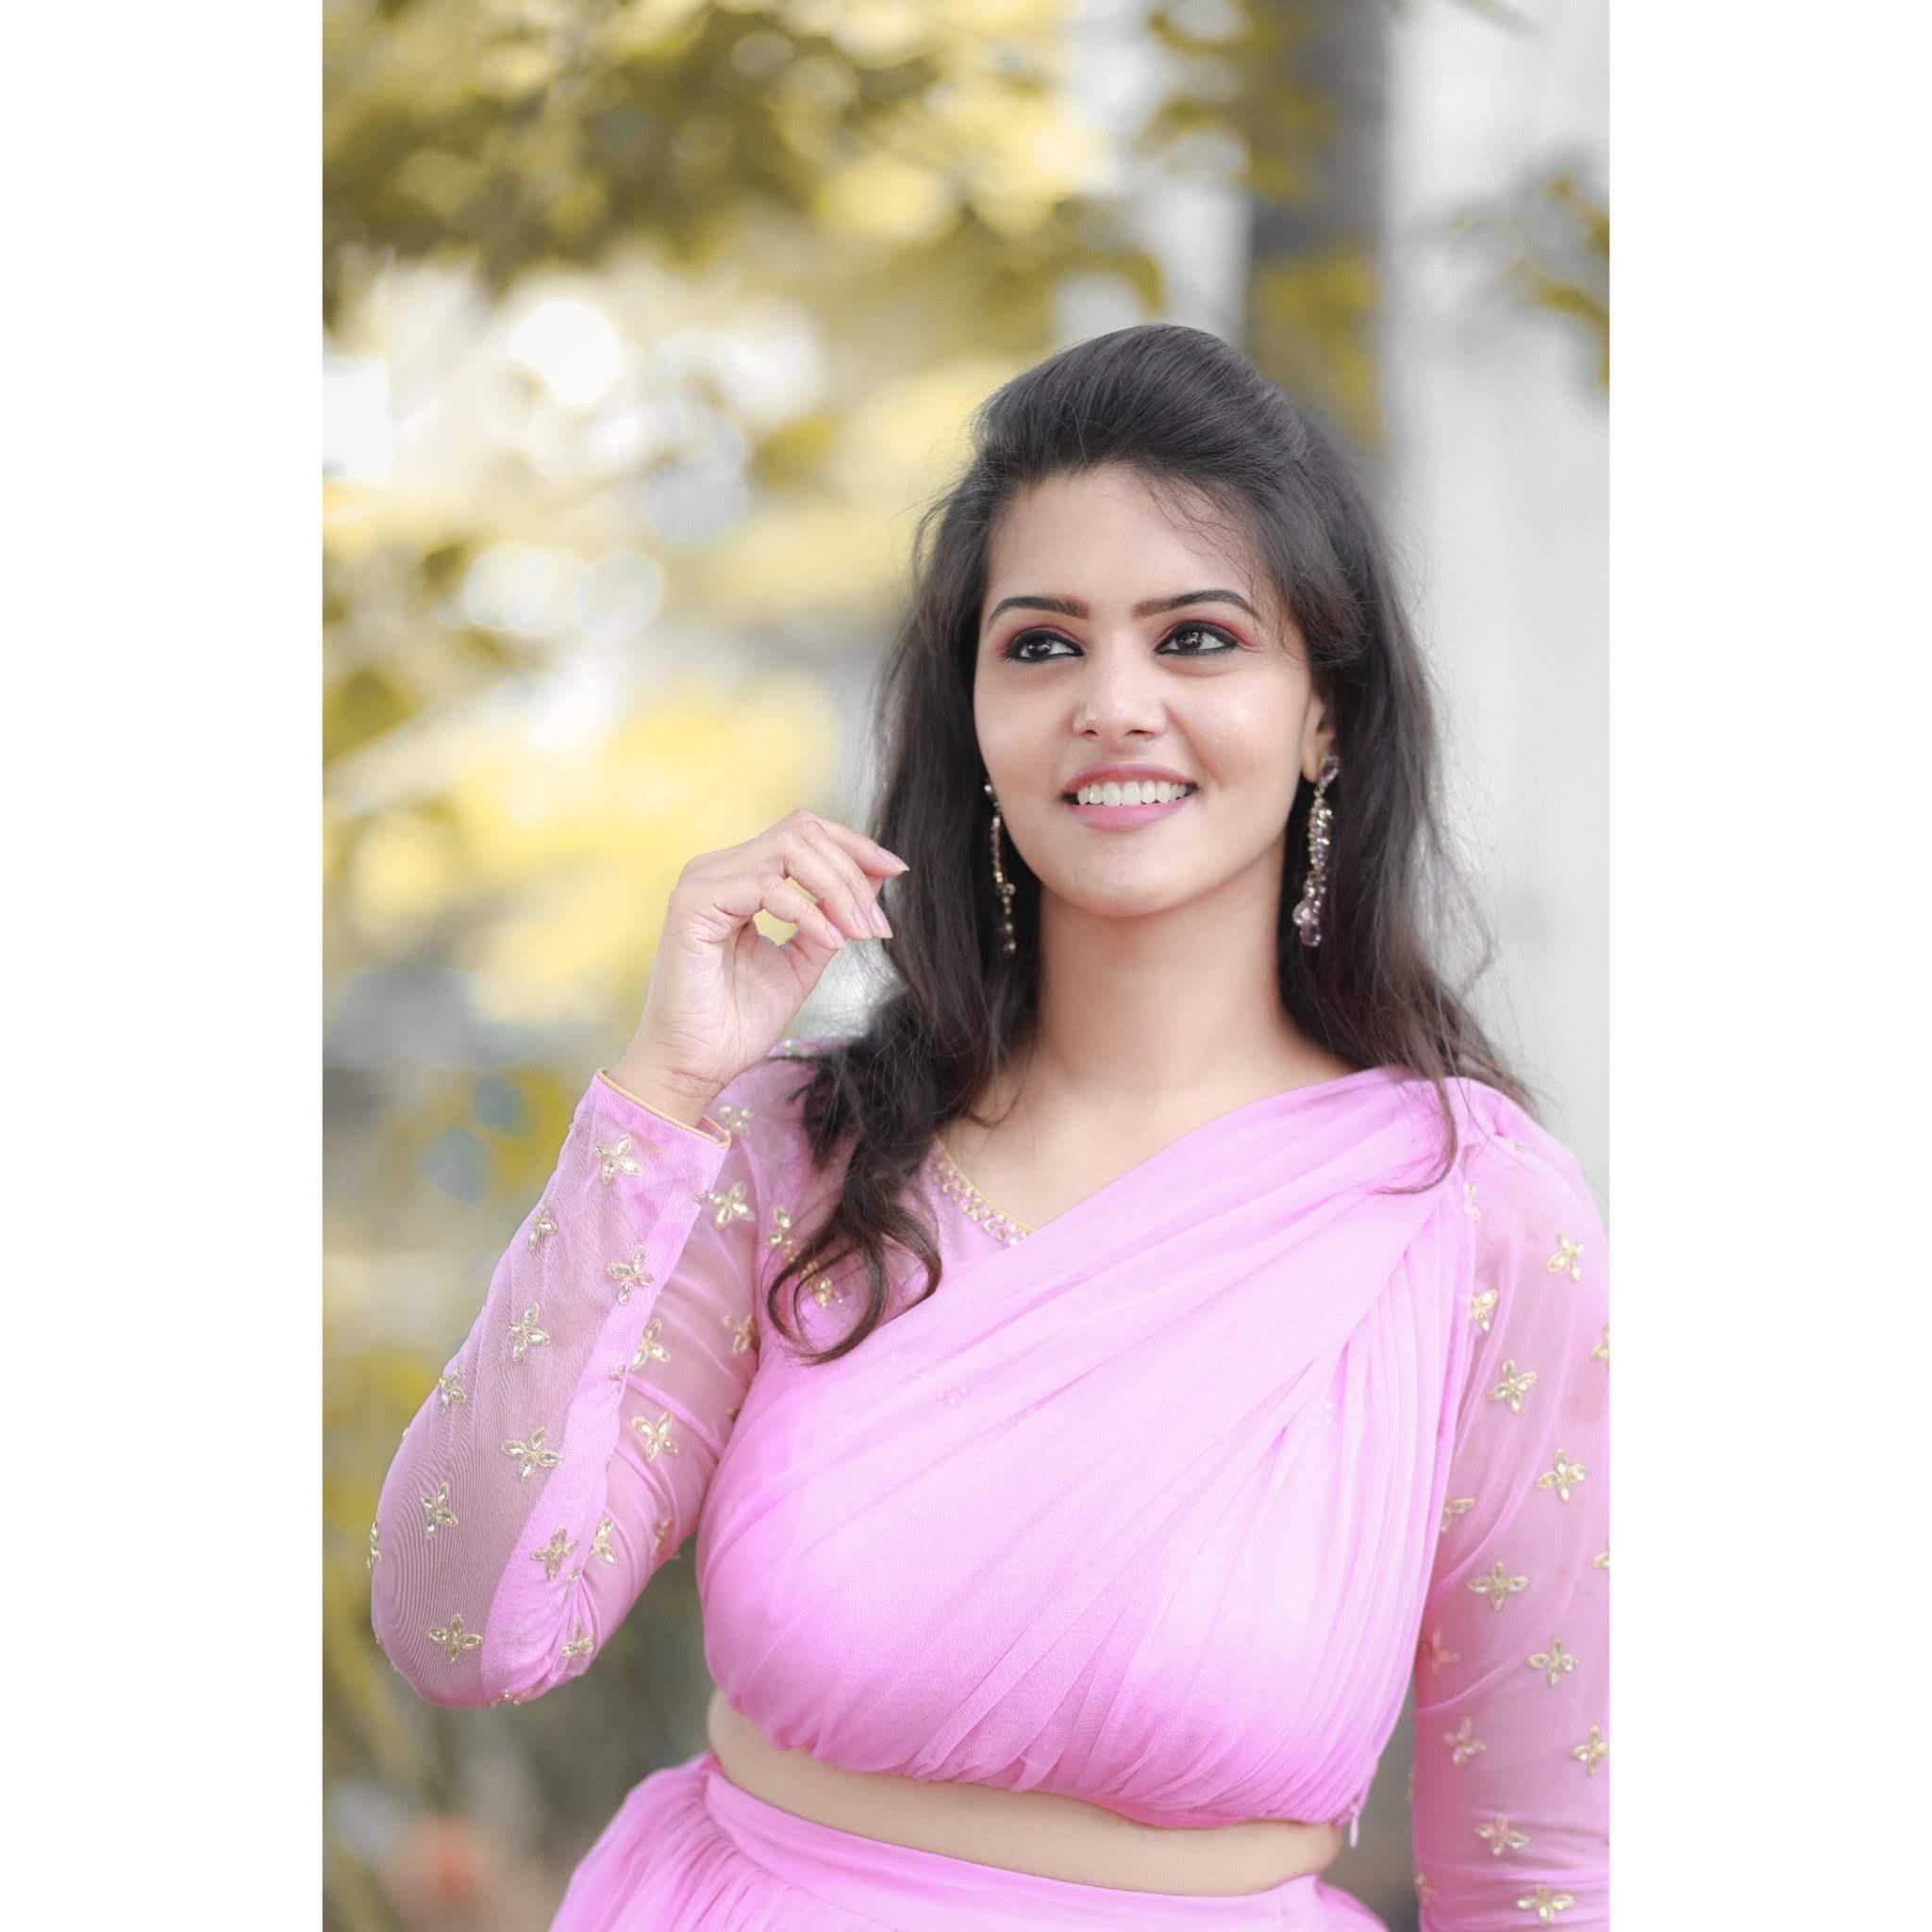 Roshni-Prakash-images-956586